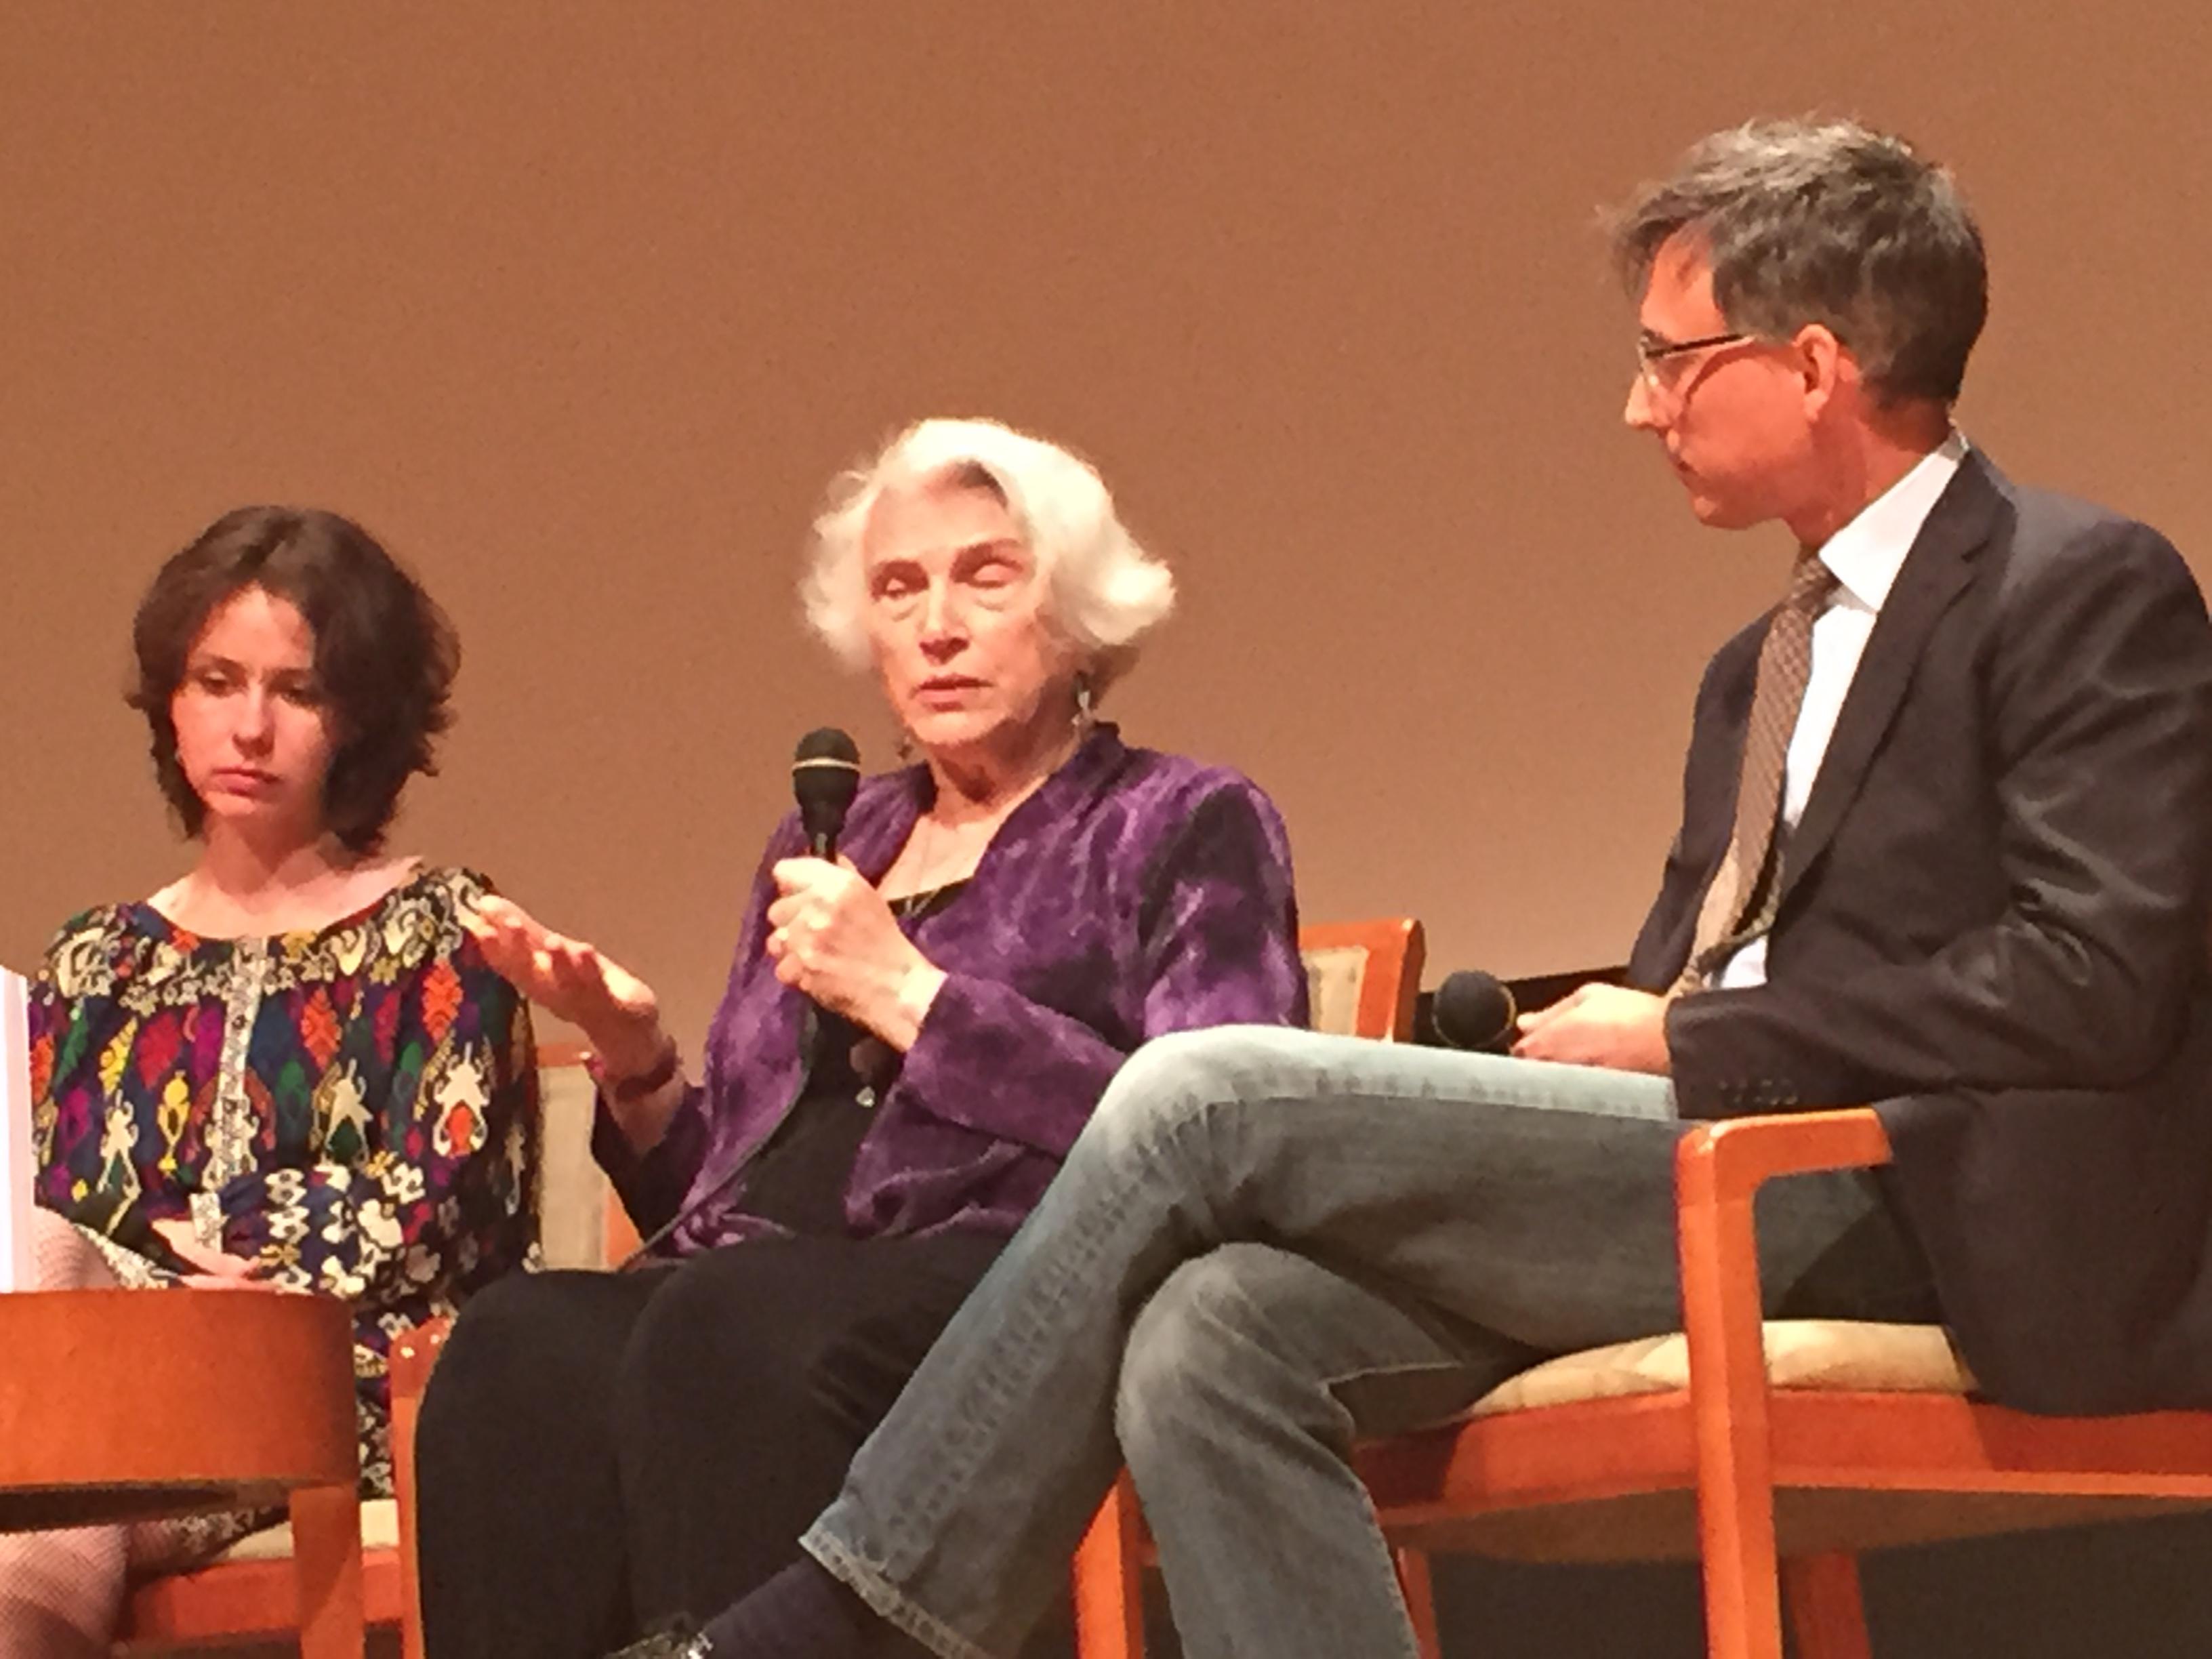 Lachka, Saidel and Ort discuss Haviva Reick in Post Film Panel DIscussion .